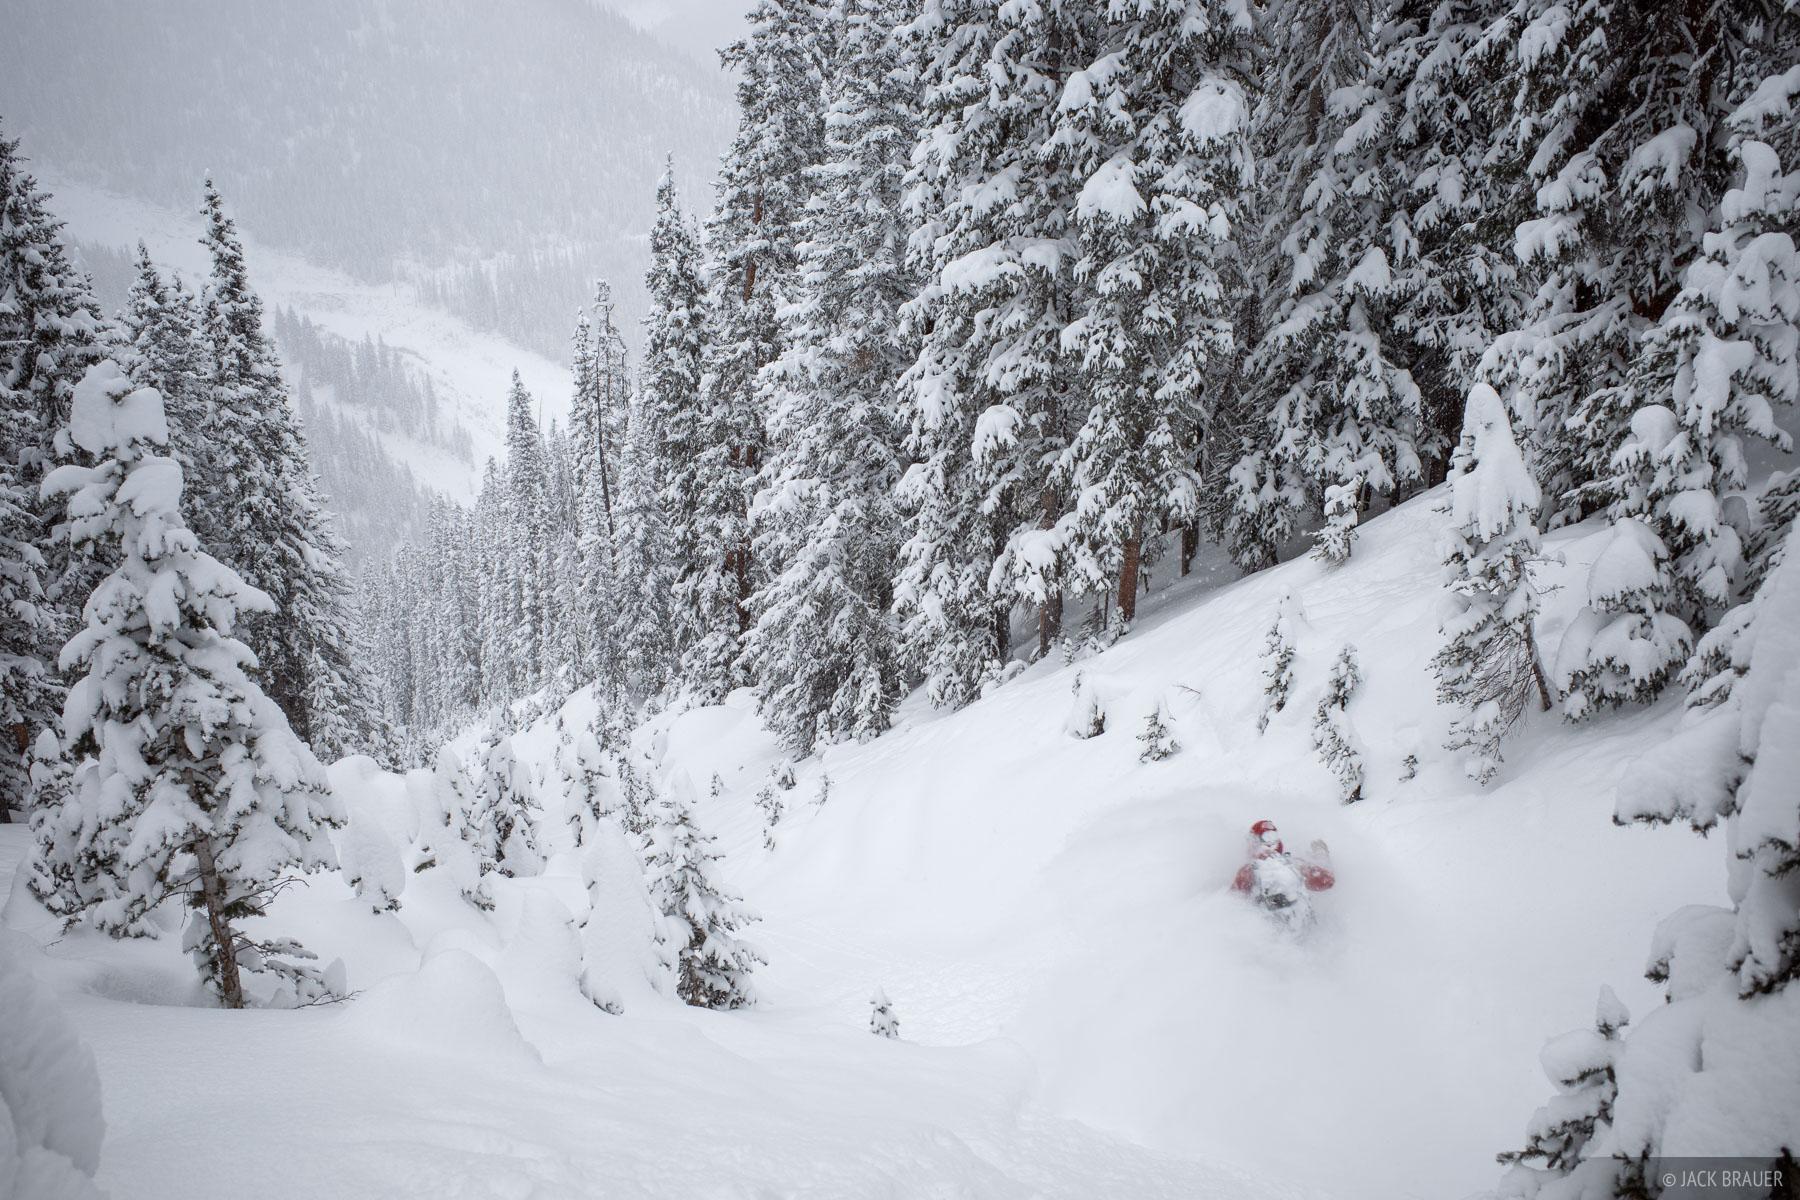 Jason Mullins floats through waist deep powder in late January.